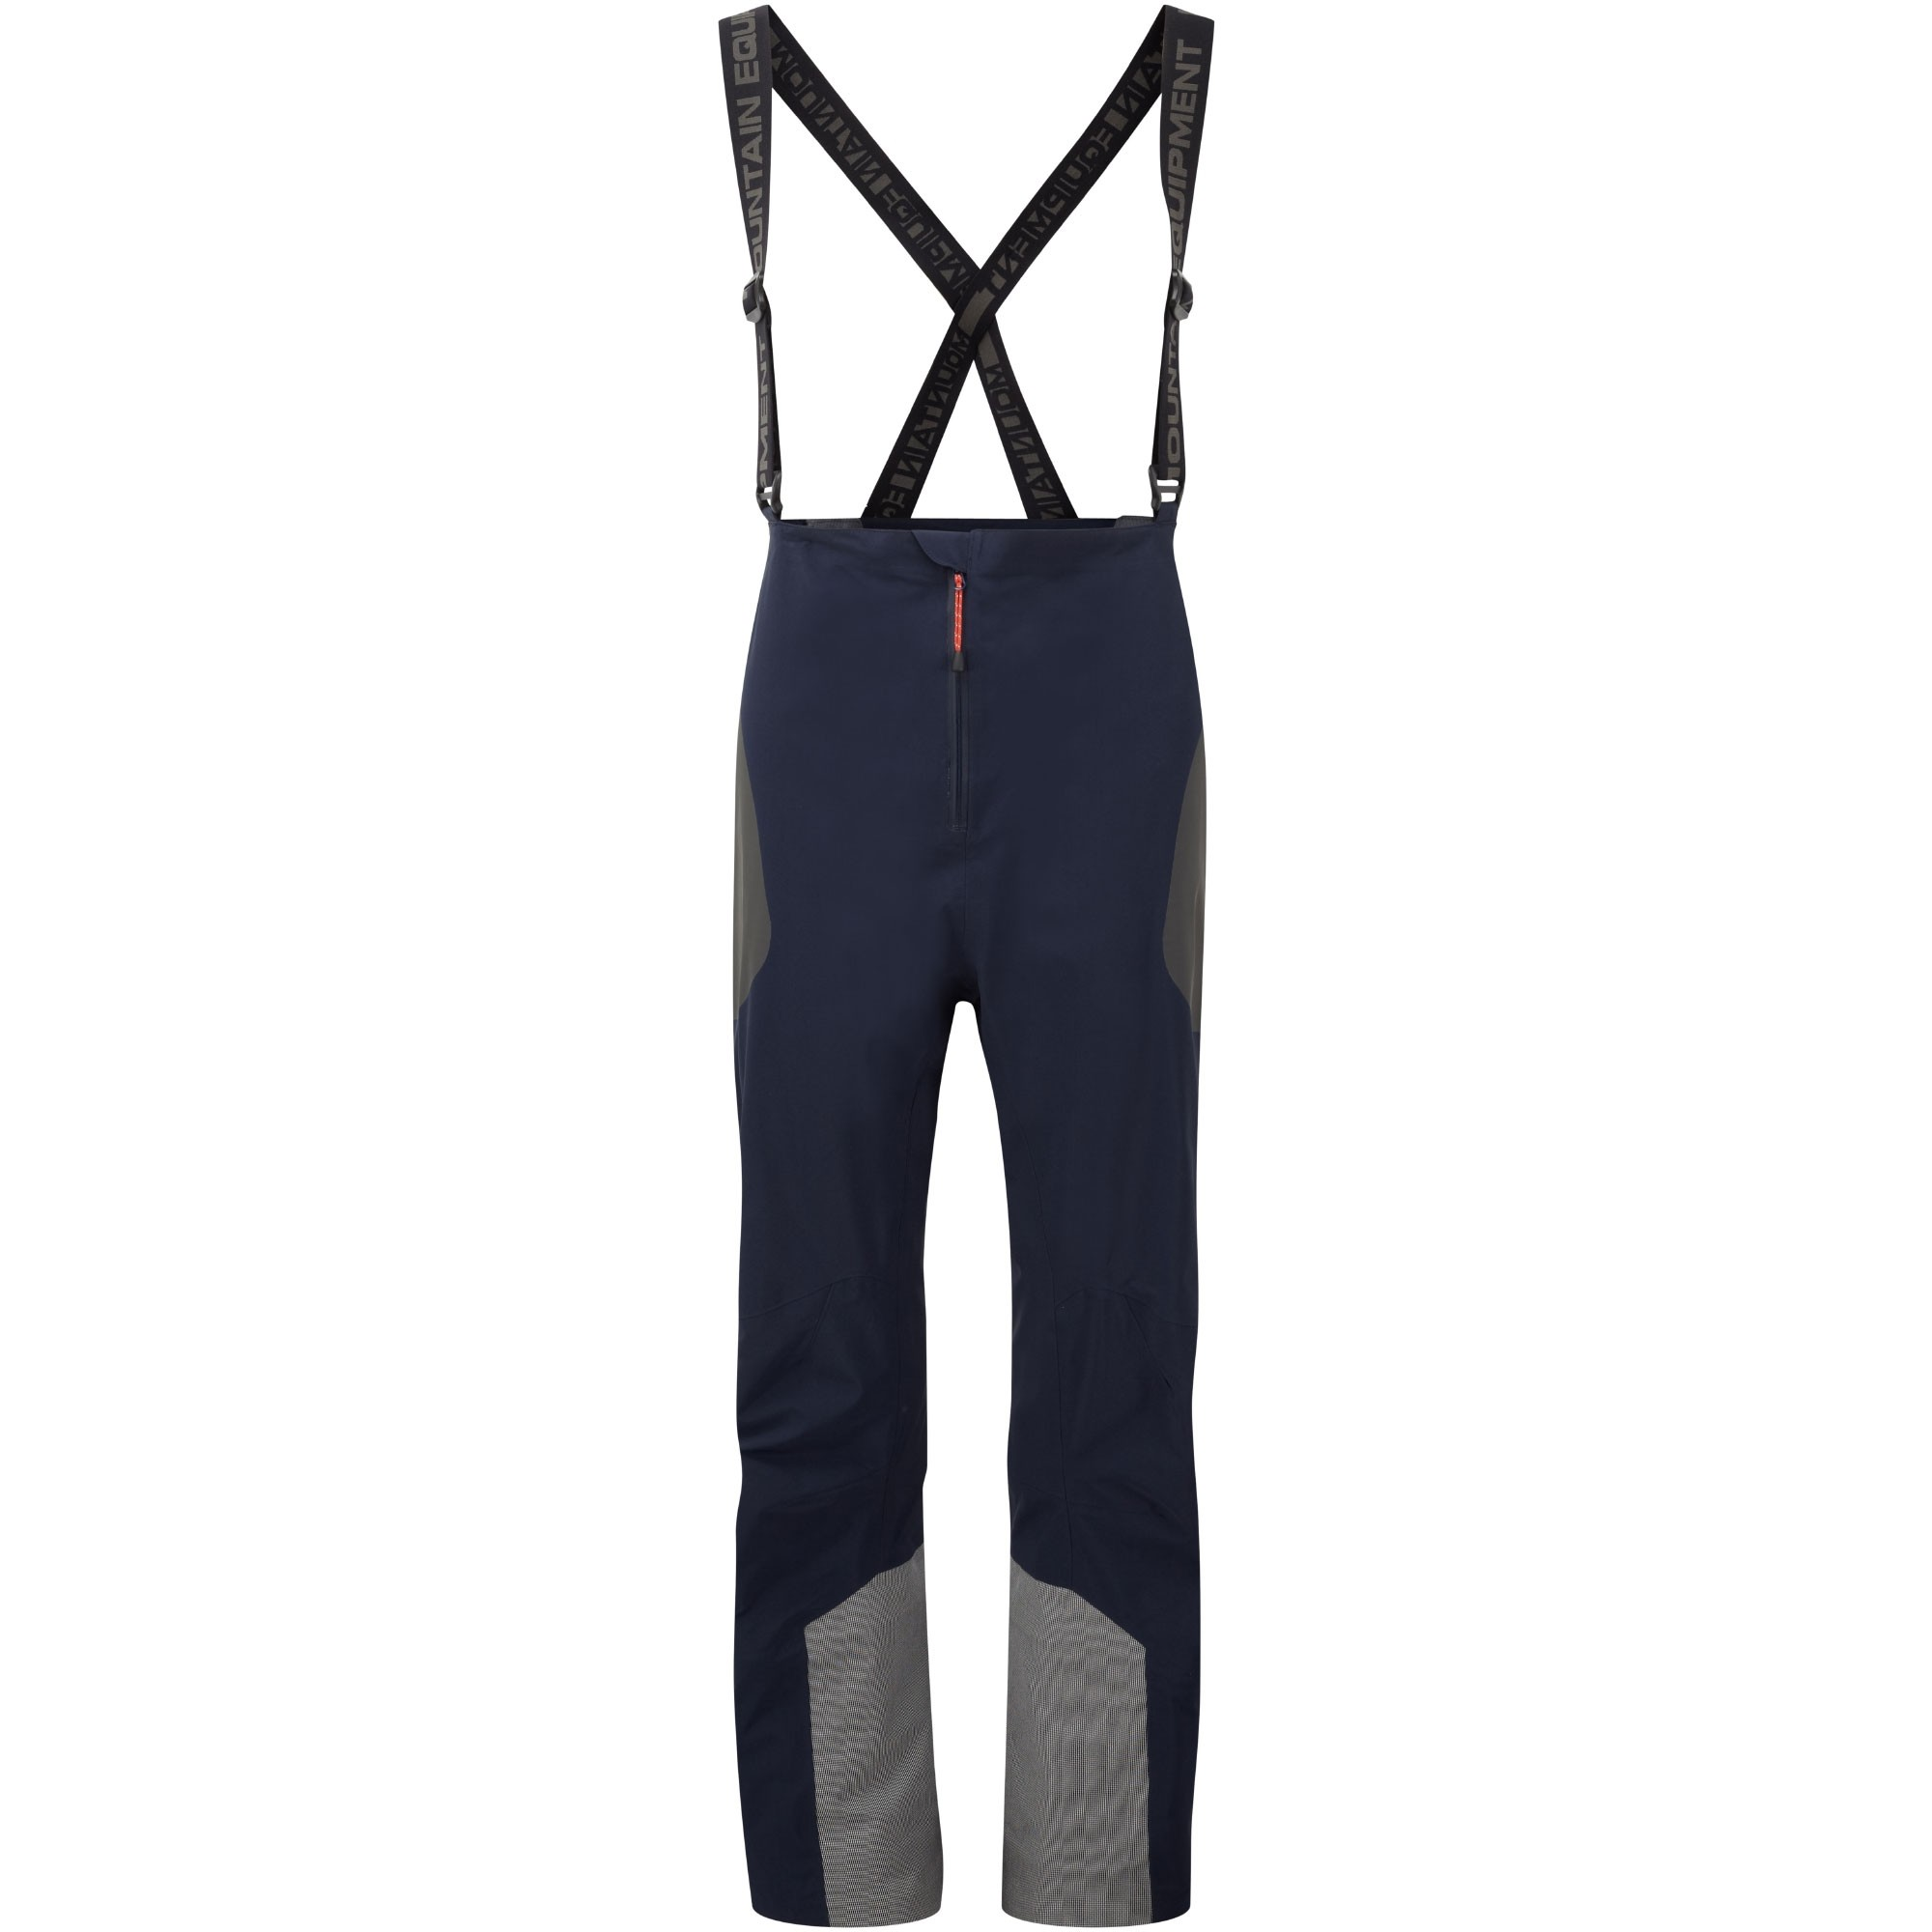 Mountain Equipment Manaslu Women's Pants - Cosmos